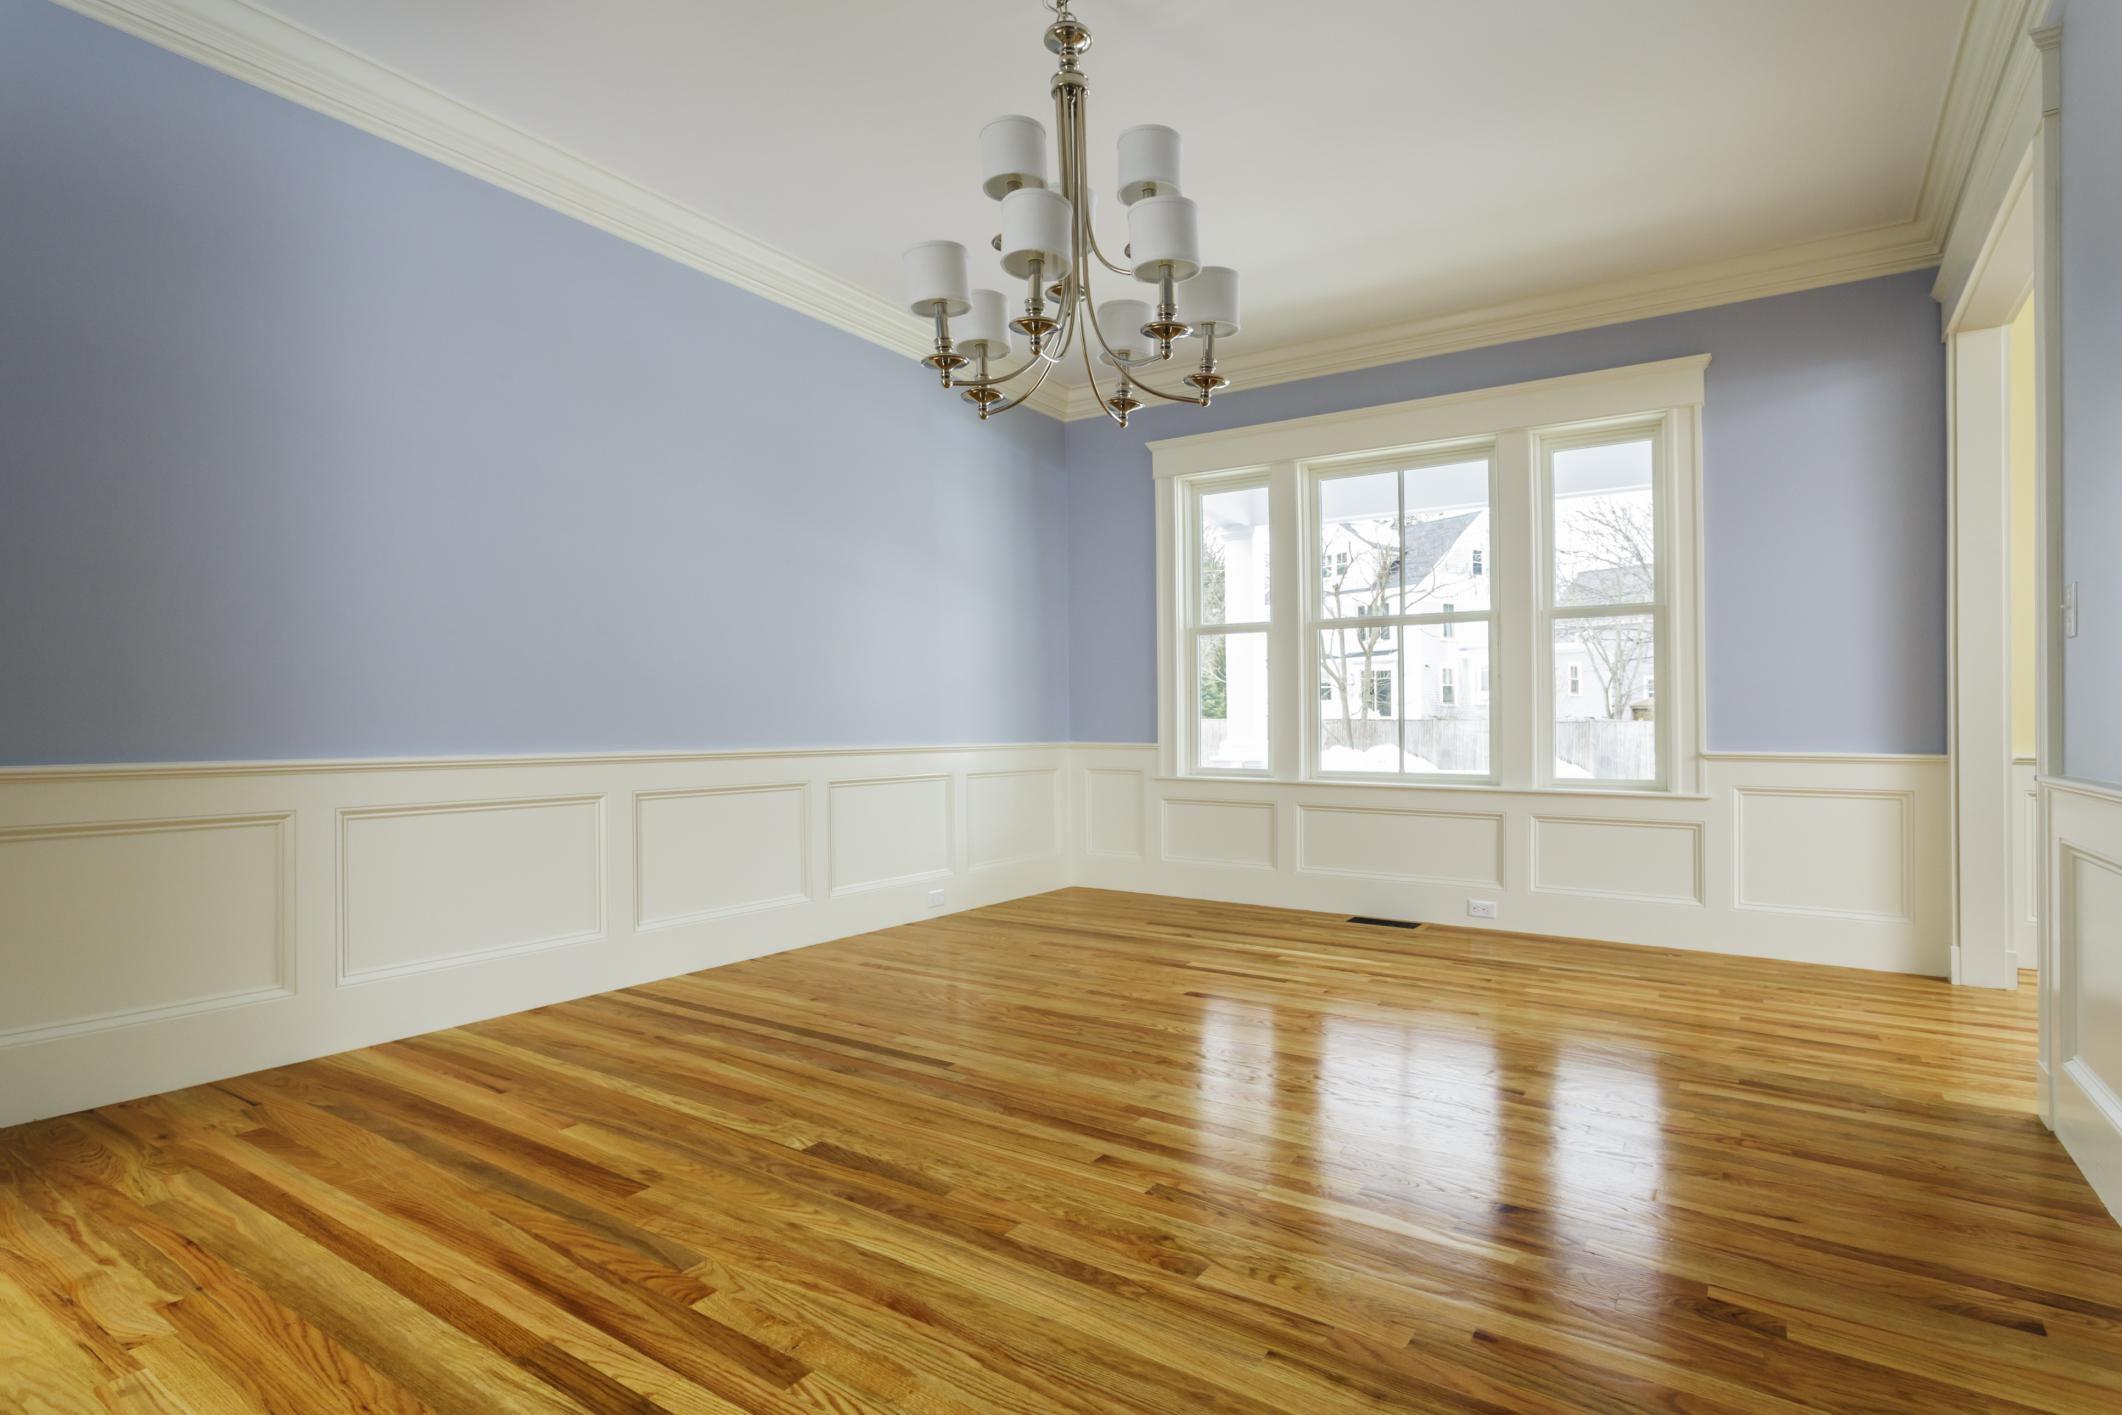 types of solid hardwood floors of engineered laminate solid hardwood wood flooring regarding 168686572 56a49ed73df78cf772834d31